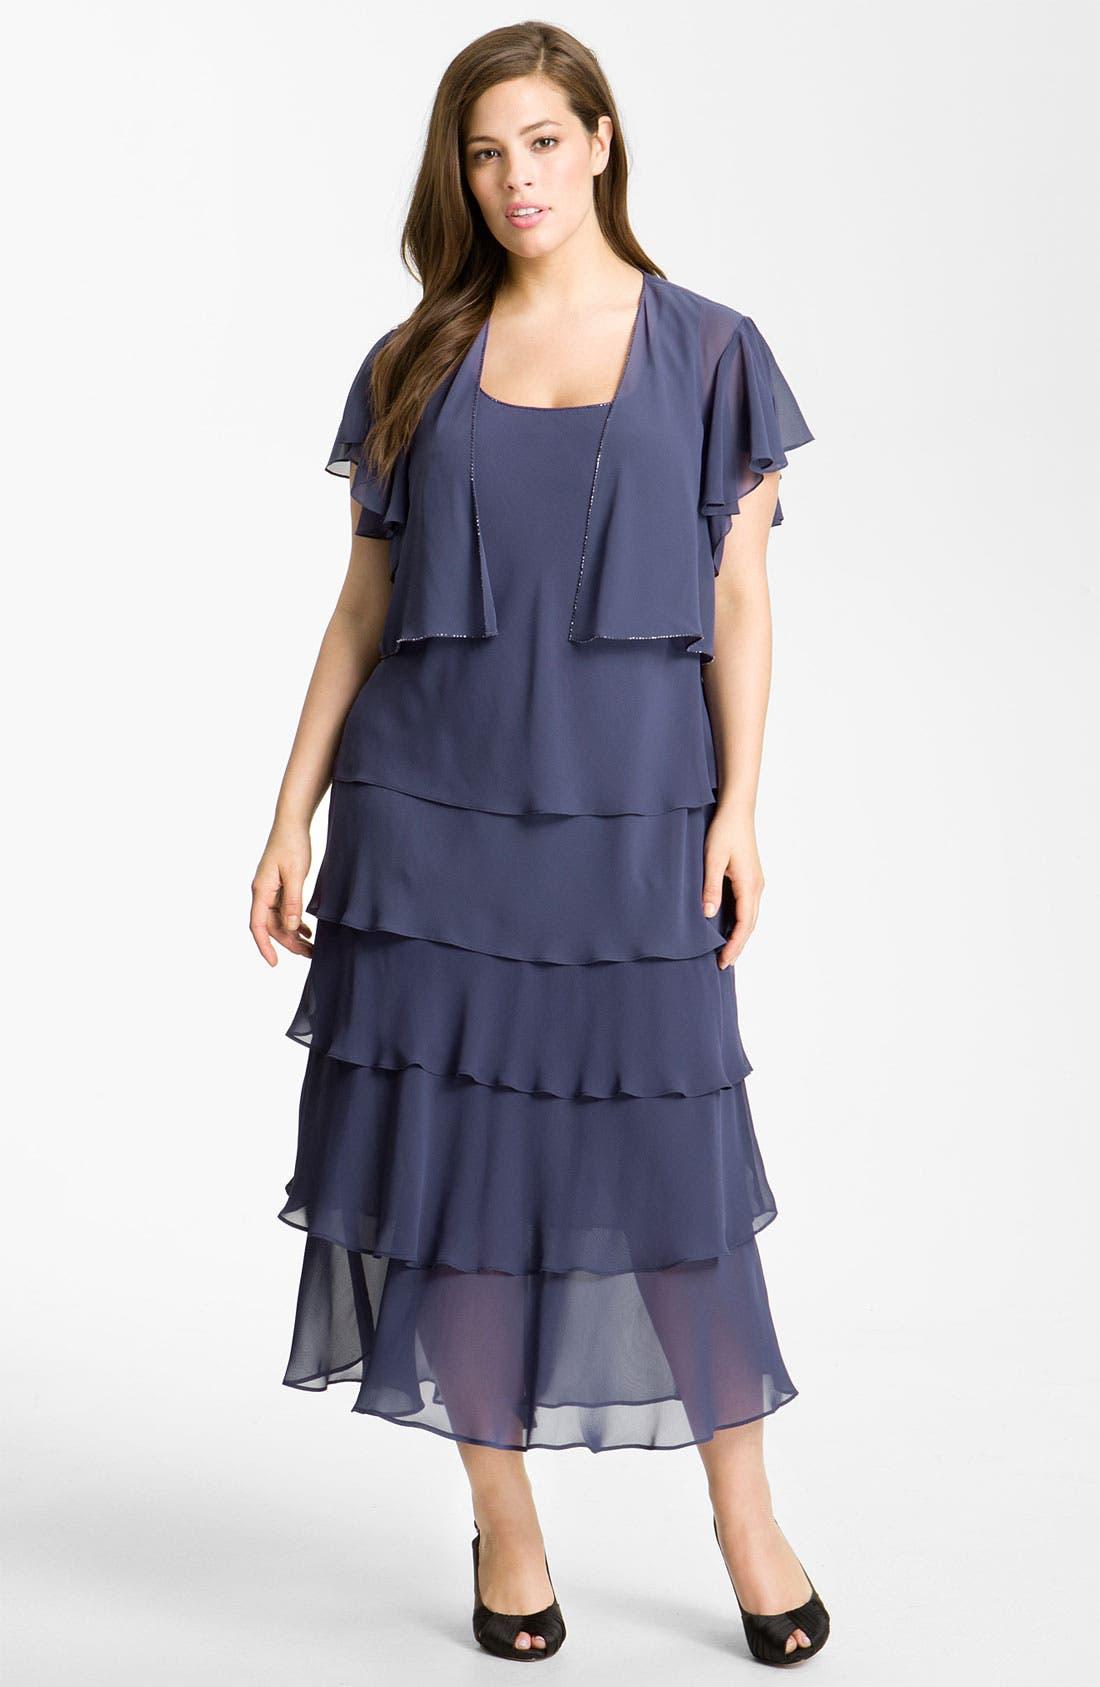 Alternate Image 1 Selected - Alex Evenings Tiered Chiffon Dress & Jacket (Plus)